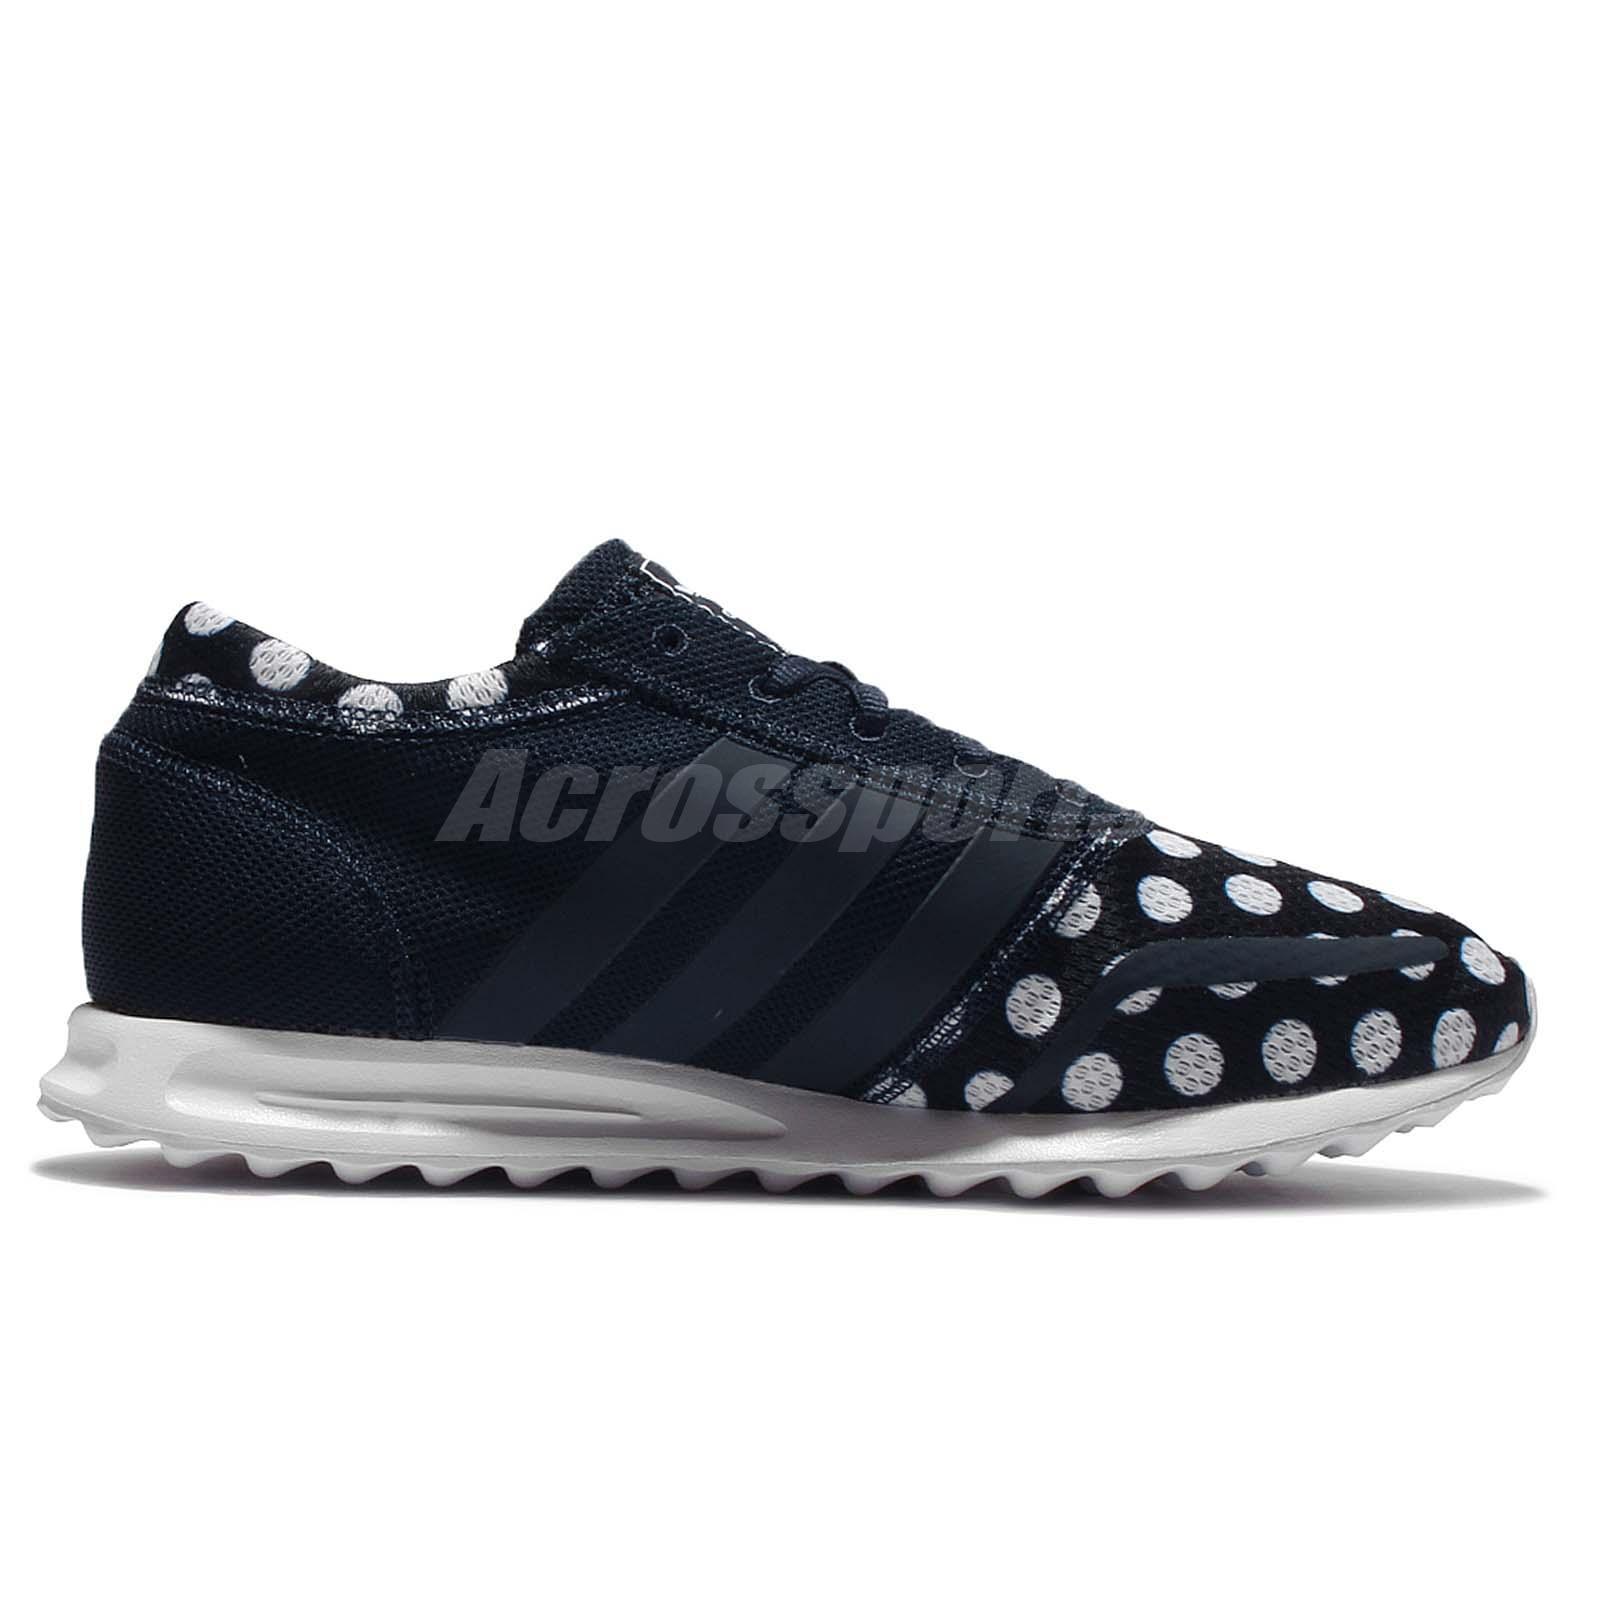 bf0428c9baa adidas Originals Los Angeles Navy White Polka Dot Men Casual Shoe ...